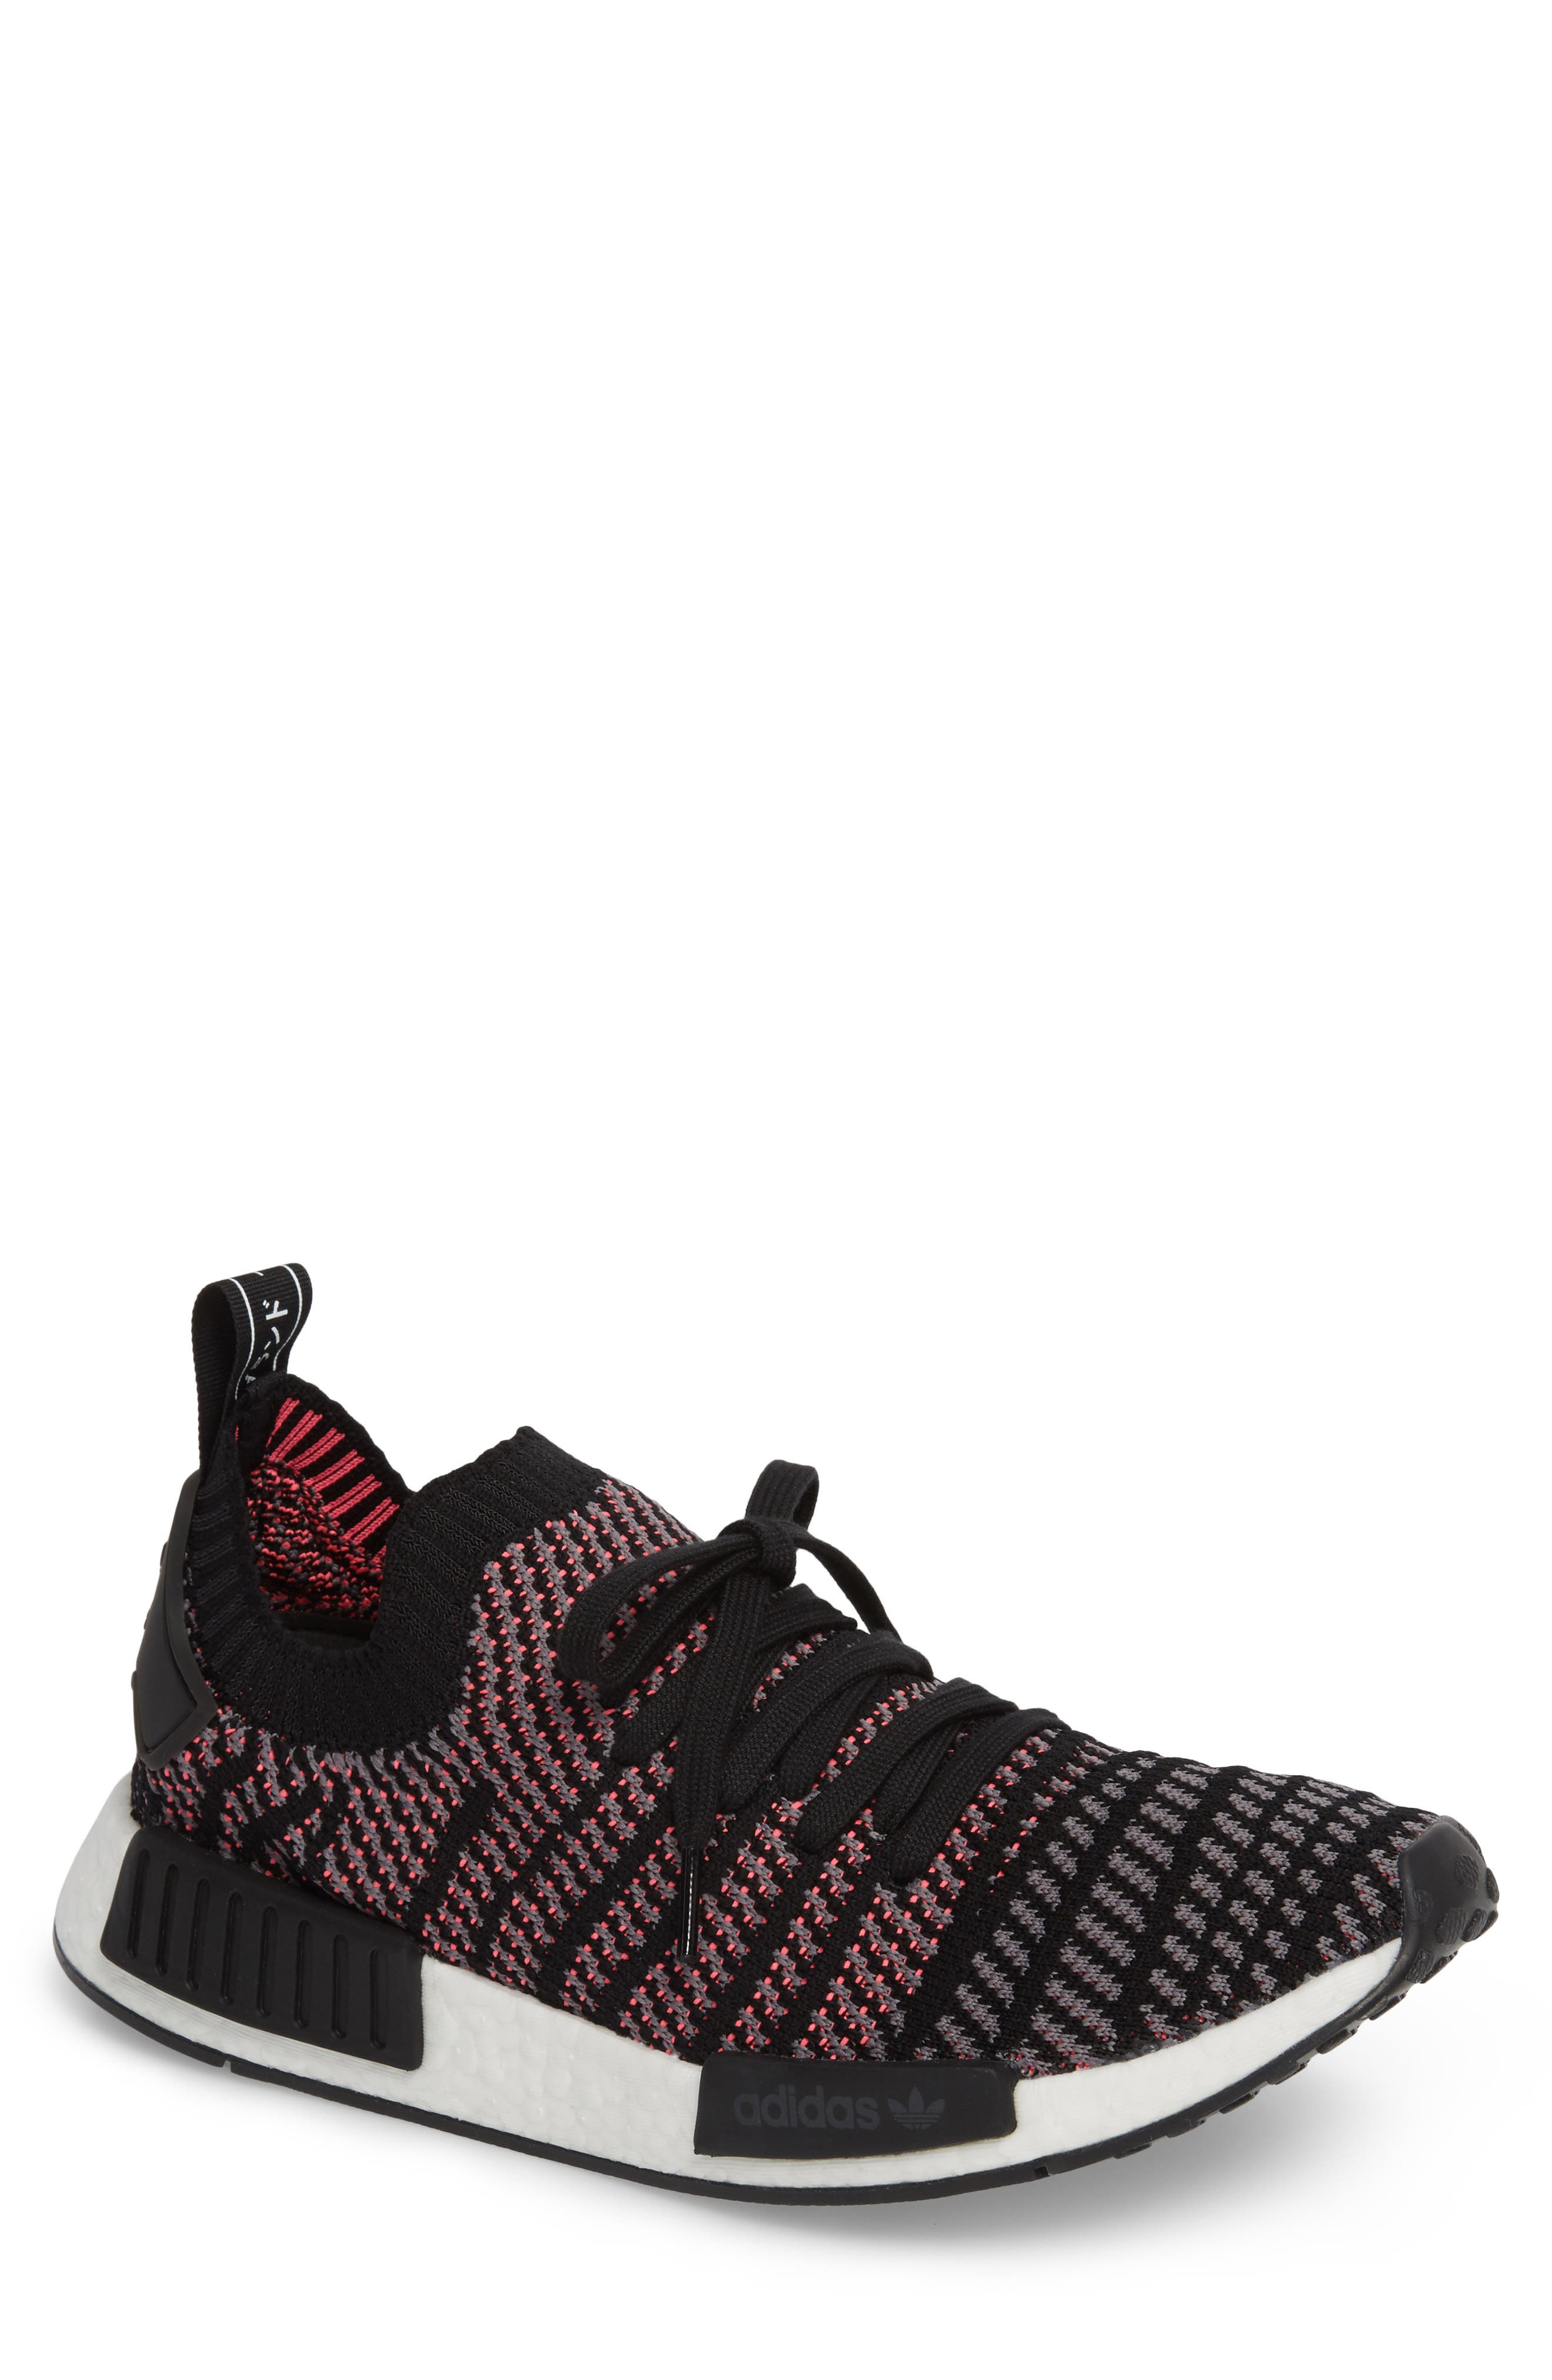 NMD R1 STLT Primeknit Sneaker,                             Main thumbnail 2, color,